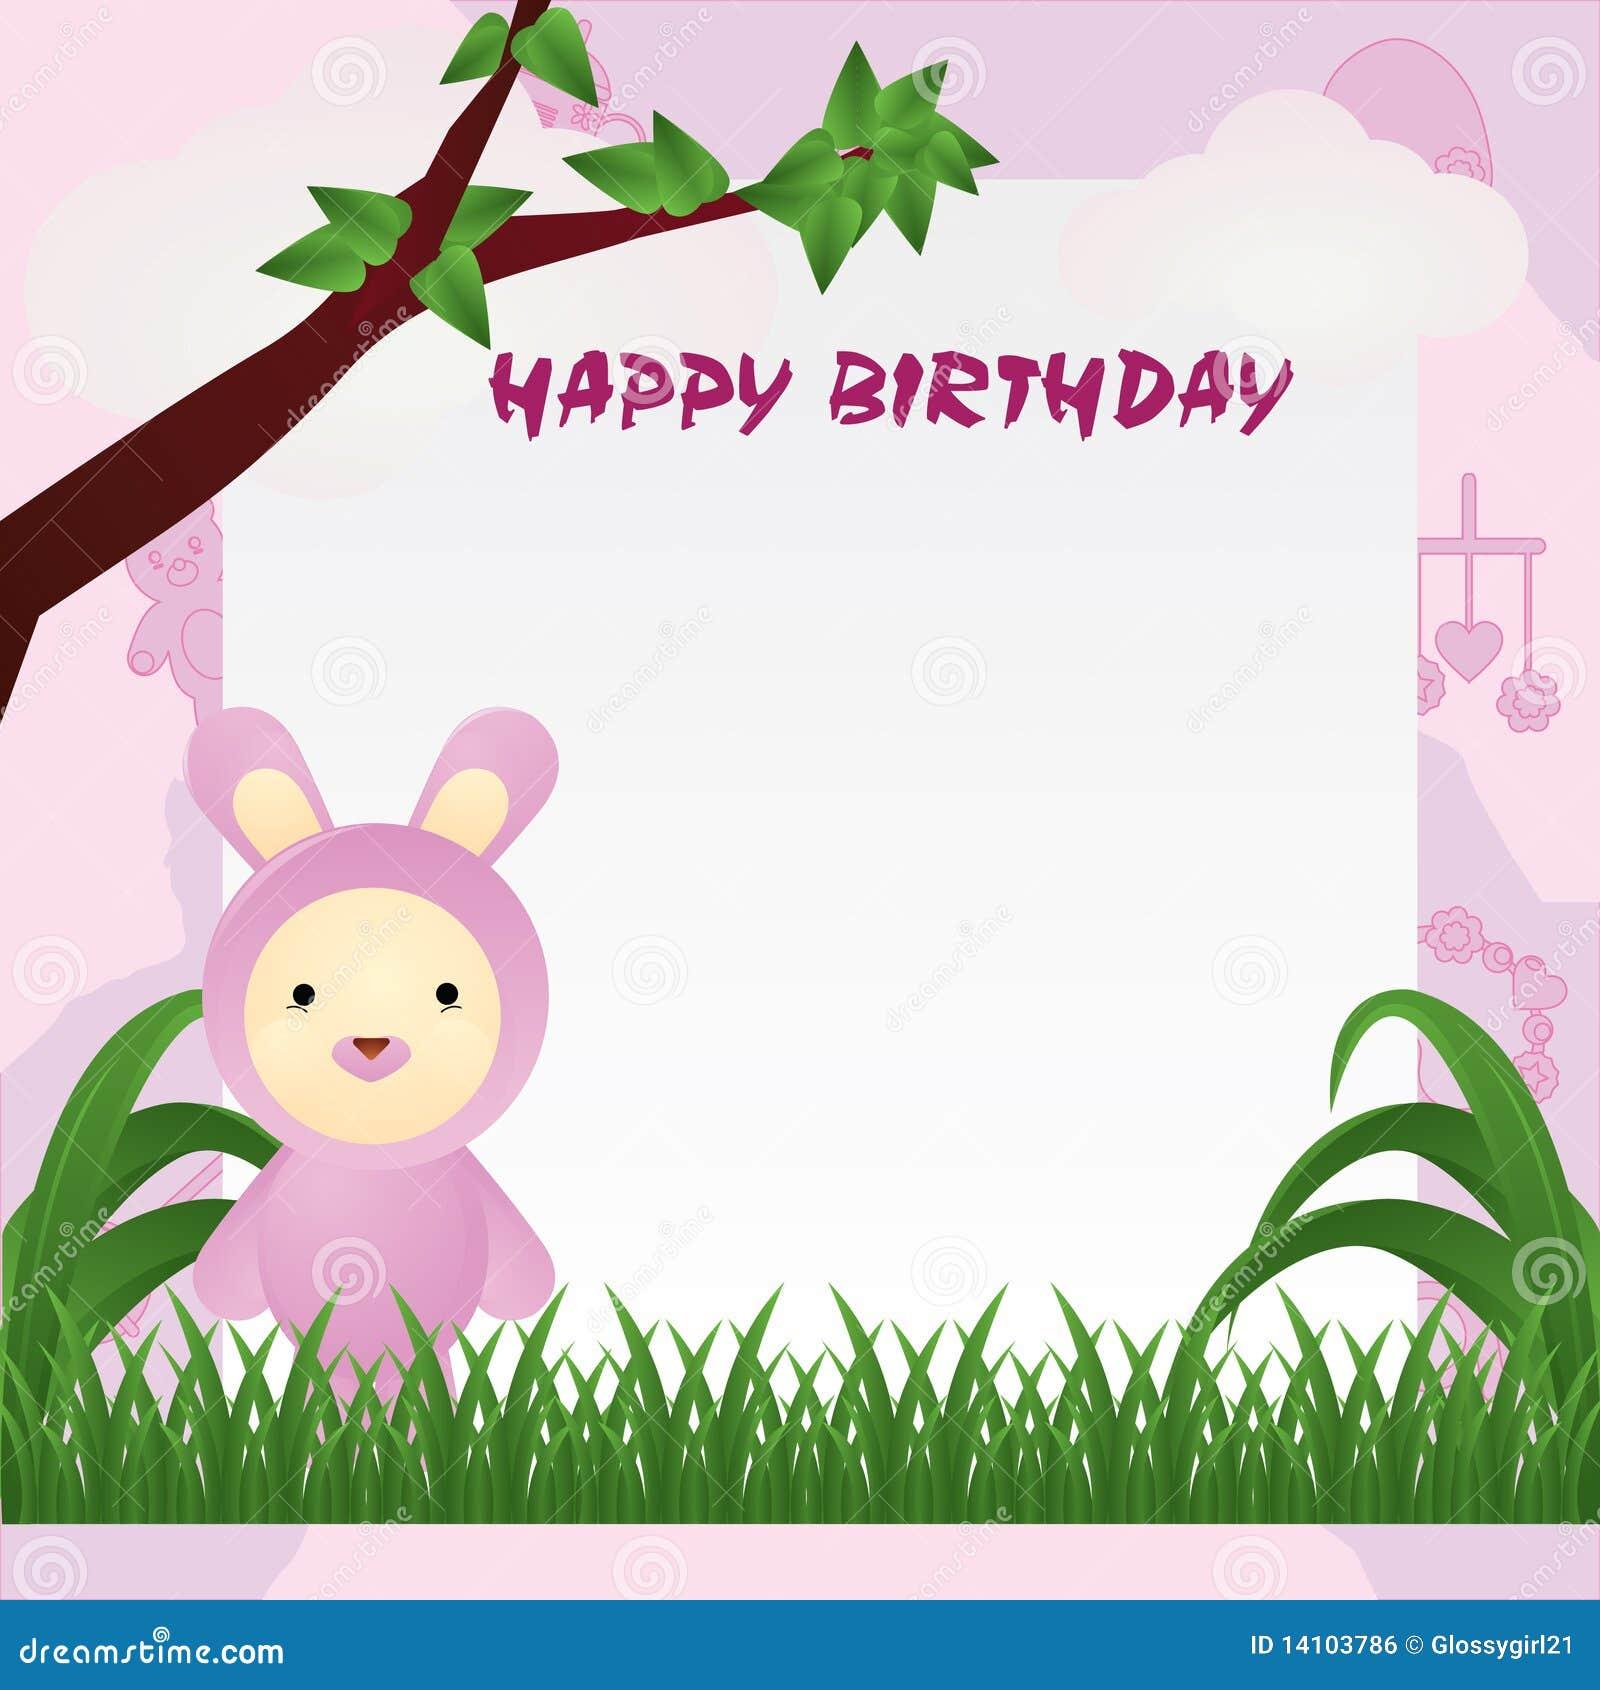 Animal Birthday Card Royalty Free Image Image 14103786 – Birthday Cards Backgrounds